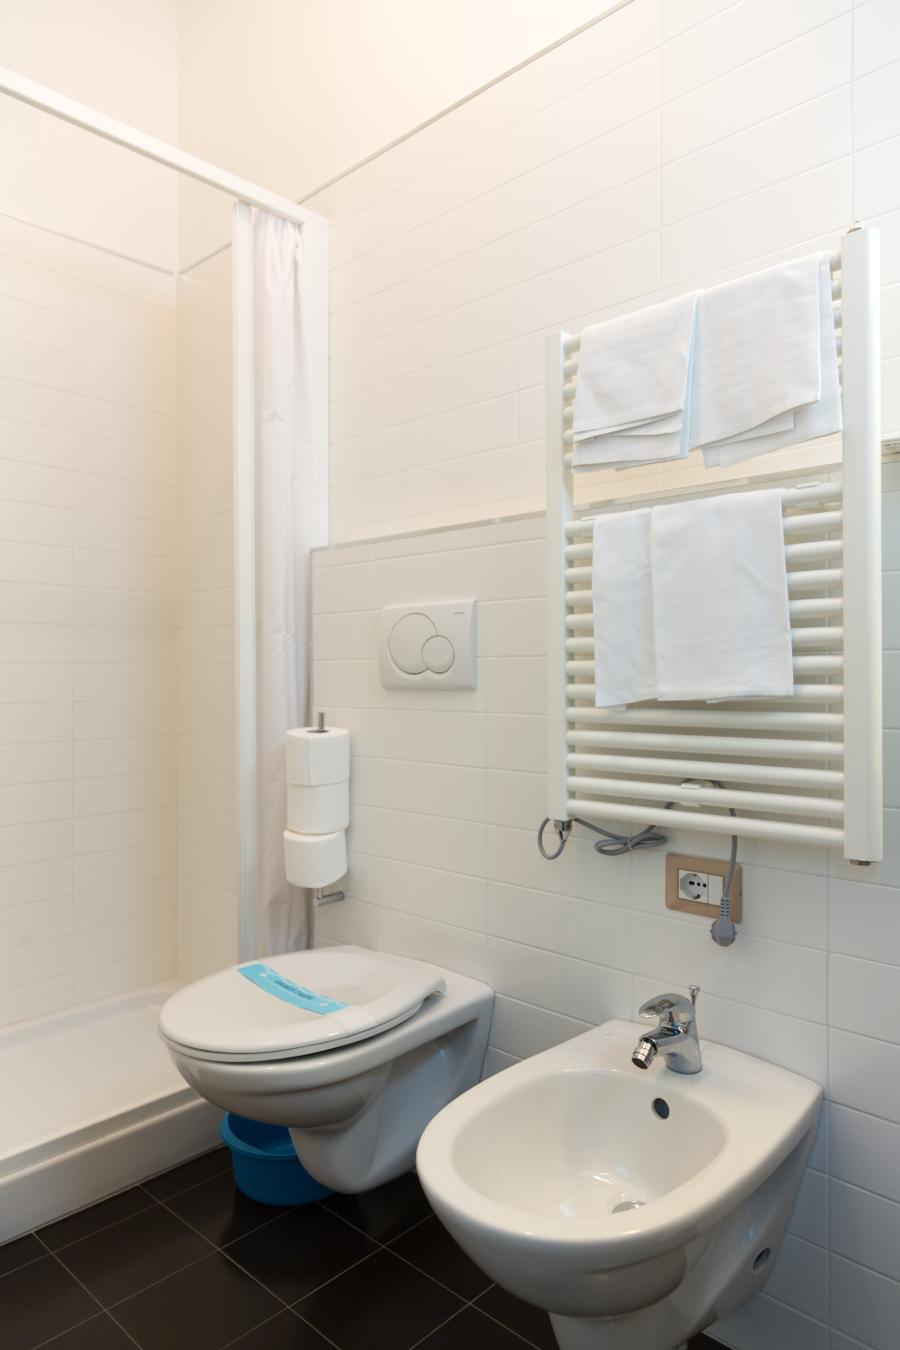 Miramare Hotel Matrimoniale Camera Comfort_2-9 Bagno